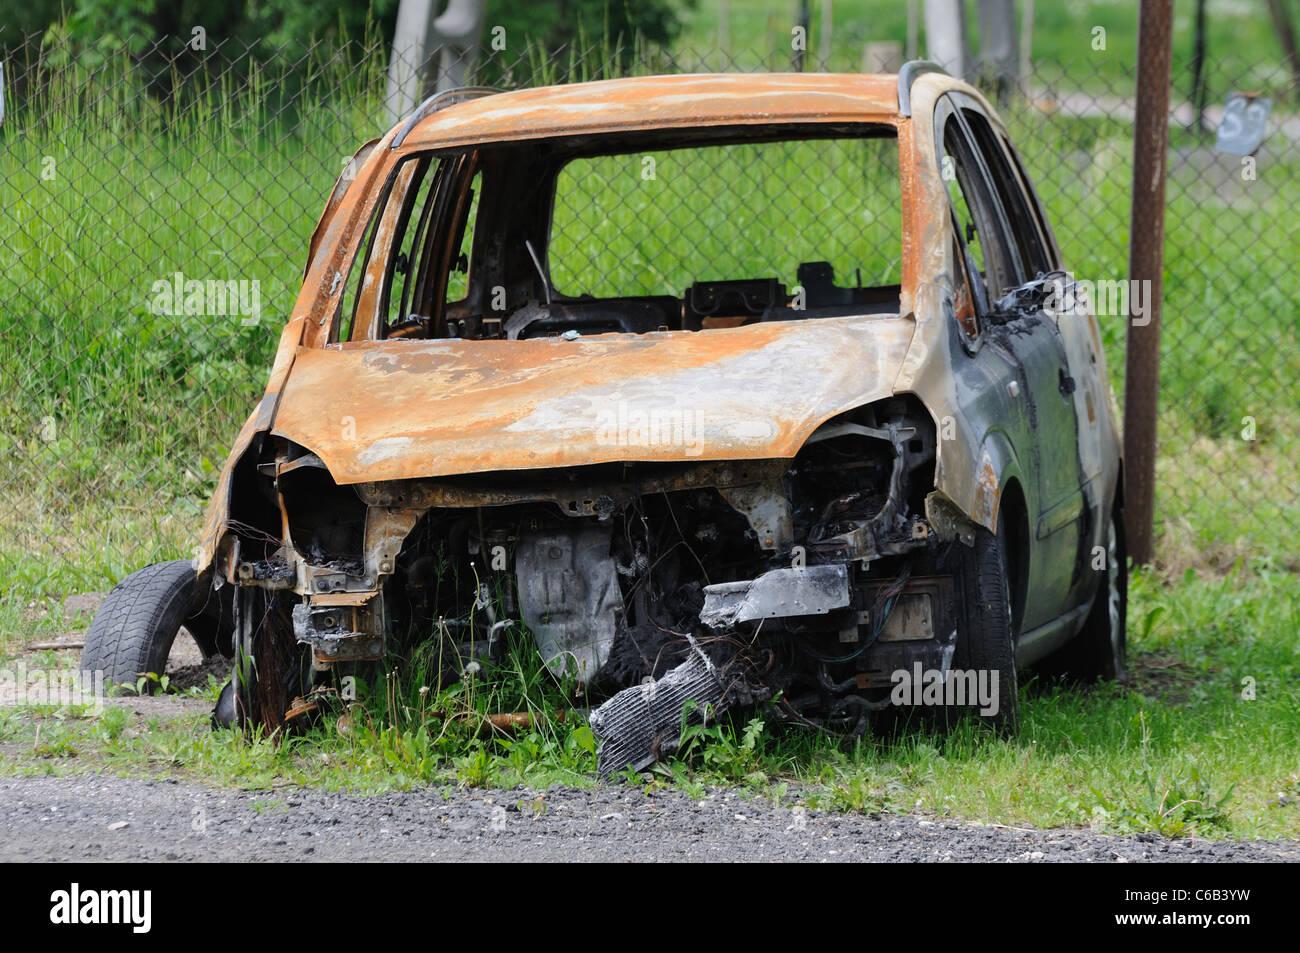 Burned Car - Stock Image